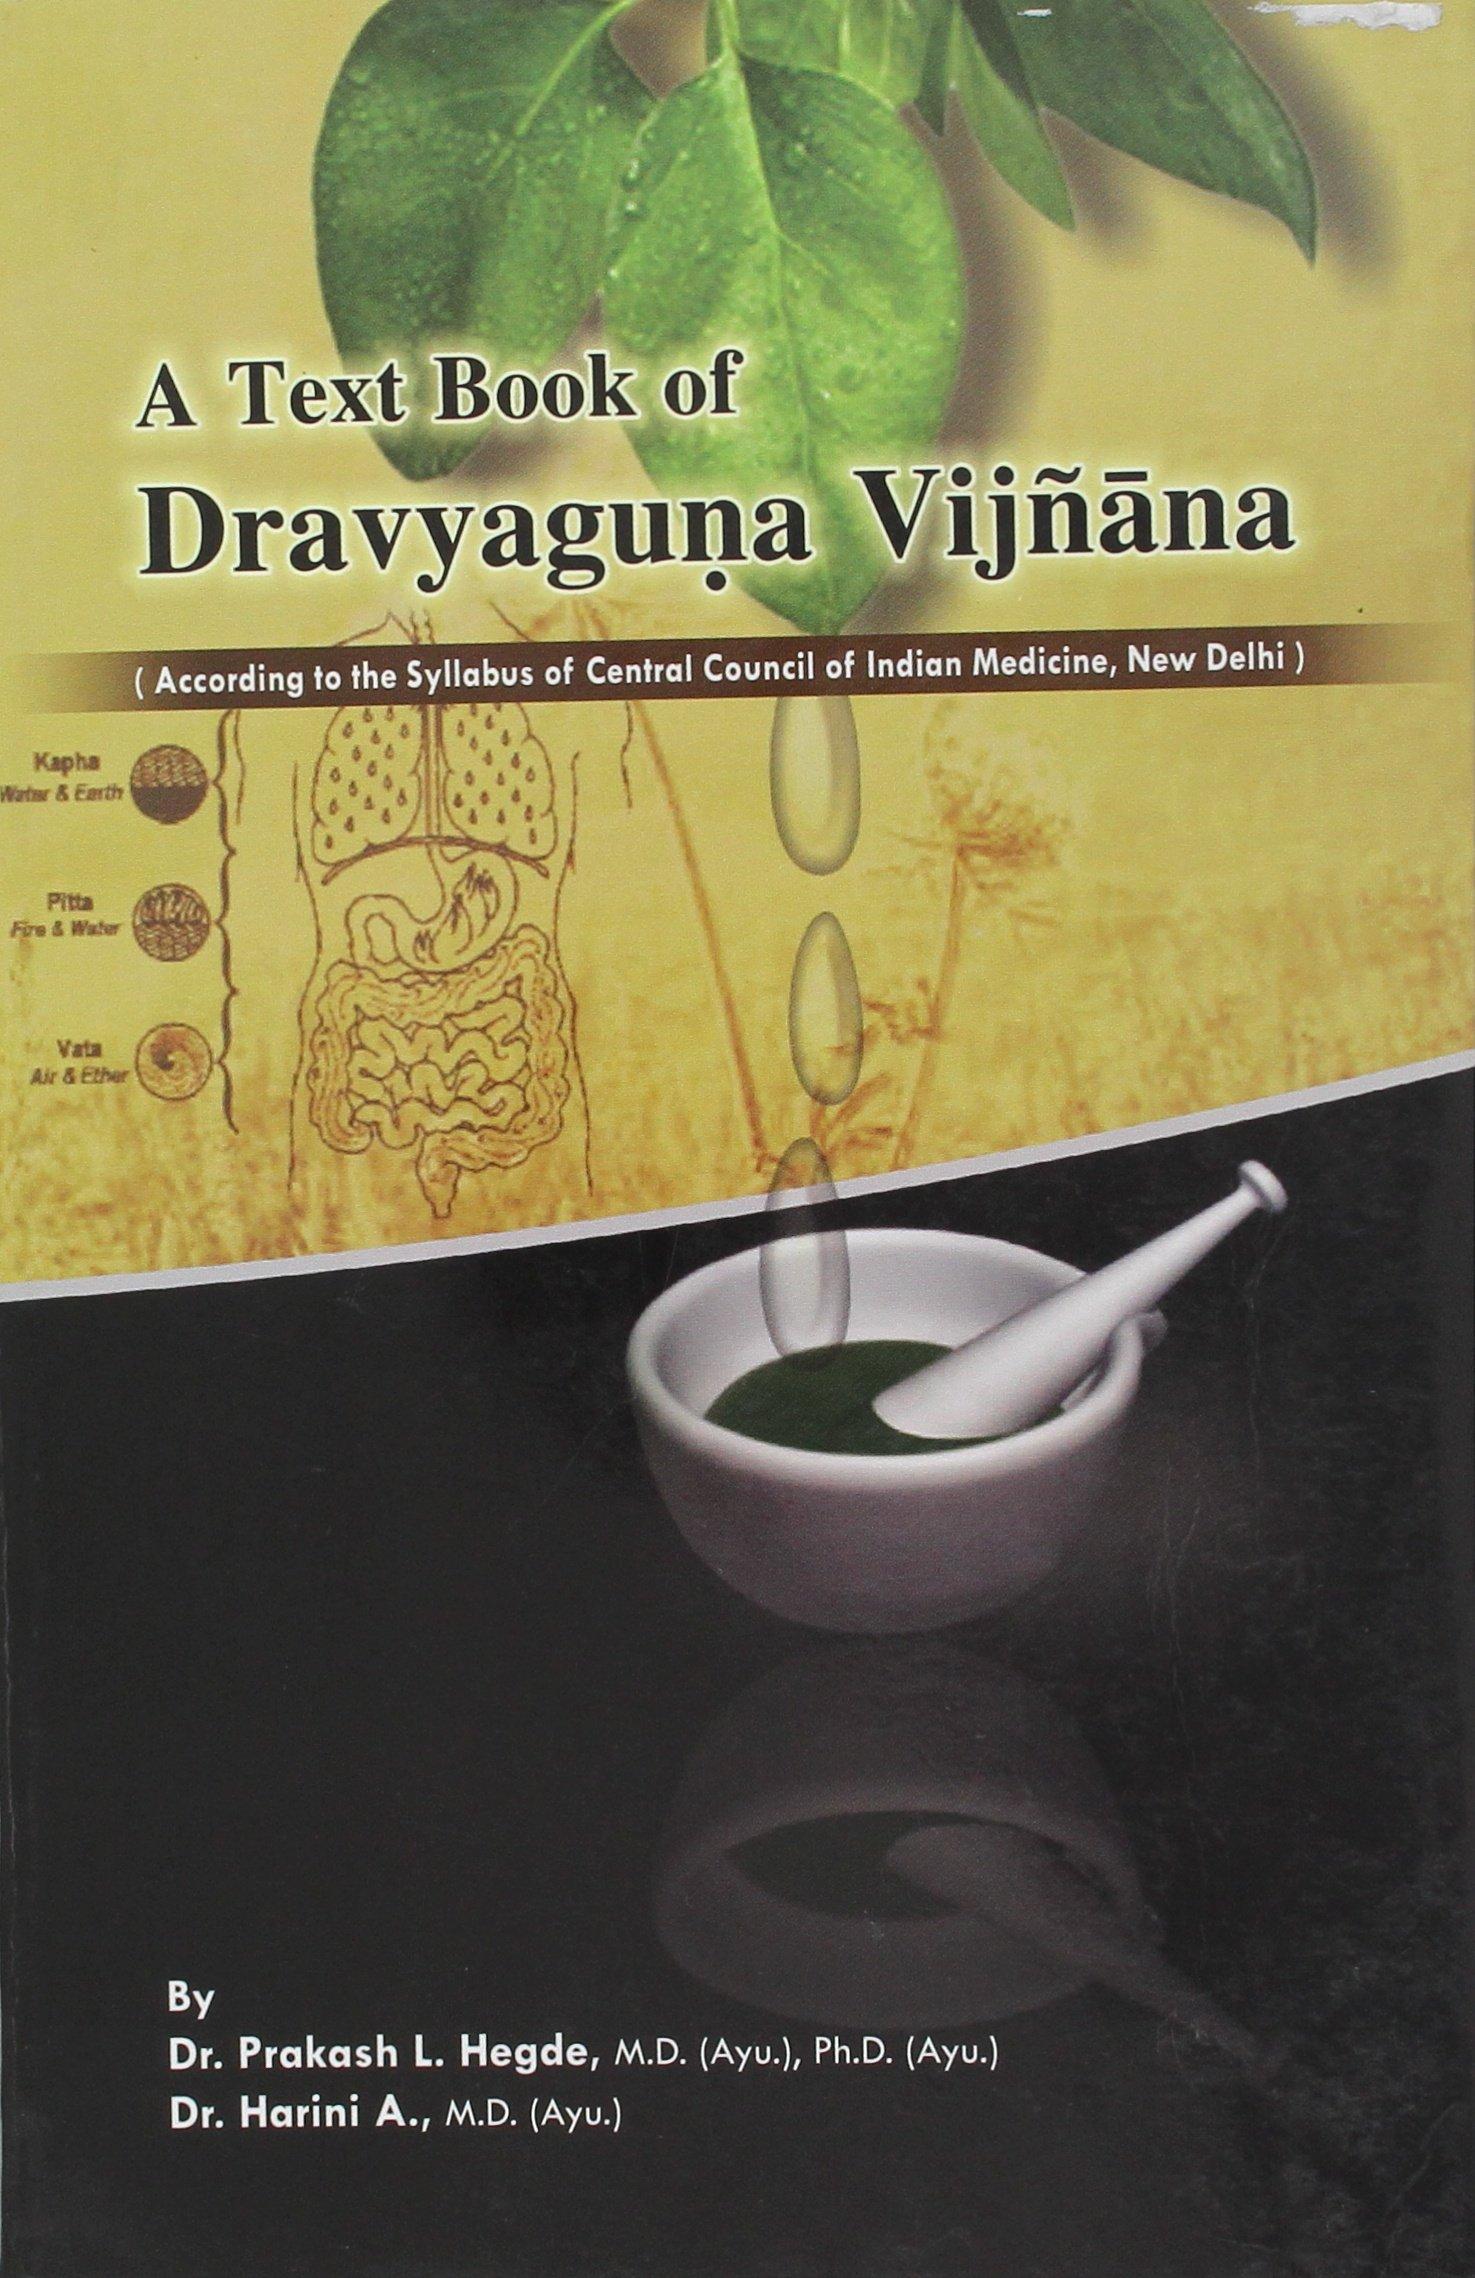 A Text Book of Dravyaguna Vijnana, Vol. 2: According to the Syllabus of Central Council of Indian Medicine, New Delhi pdf epub